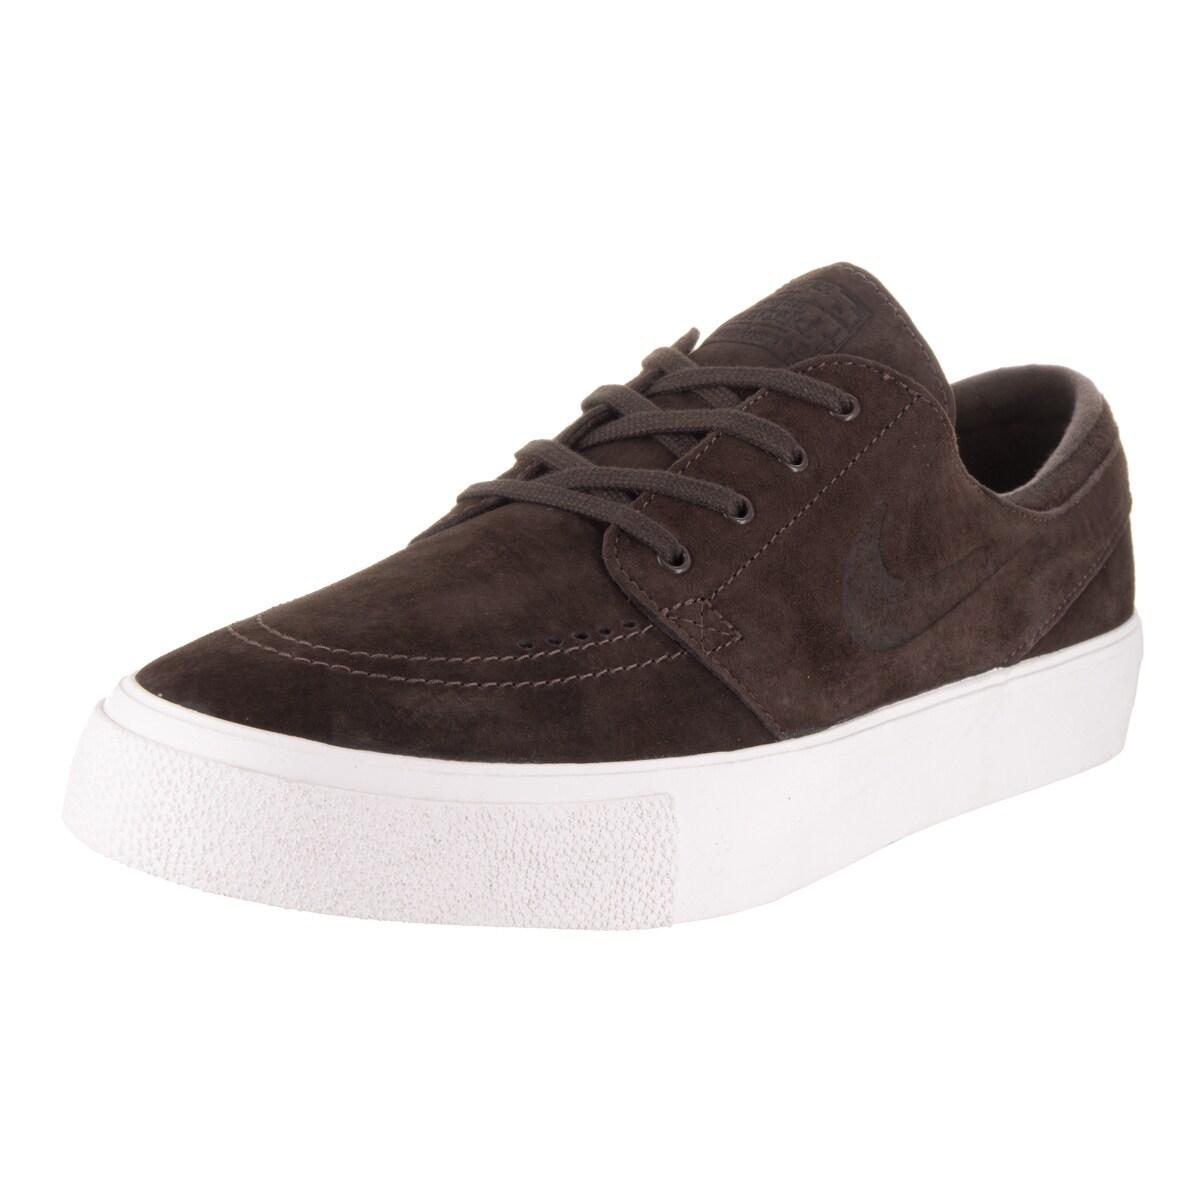 separation shoes c4cad f4946 Shop Nike Men s Zoom Stefan Janoski Prem HT Brown Nubuck Skate Shoes - Free  Shipping Today - Overstock.com - 13478165